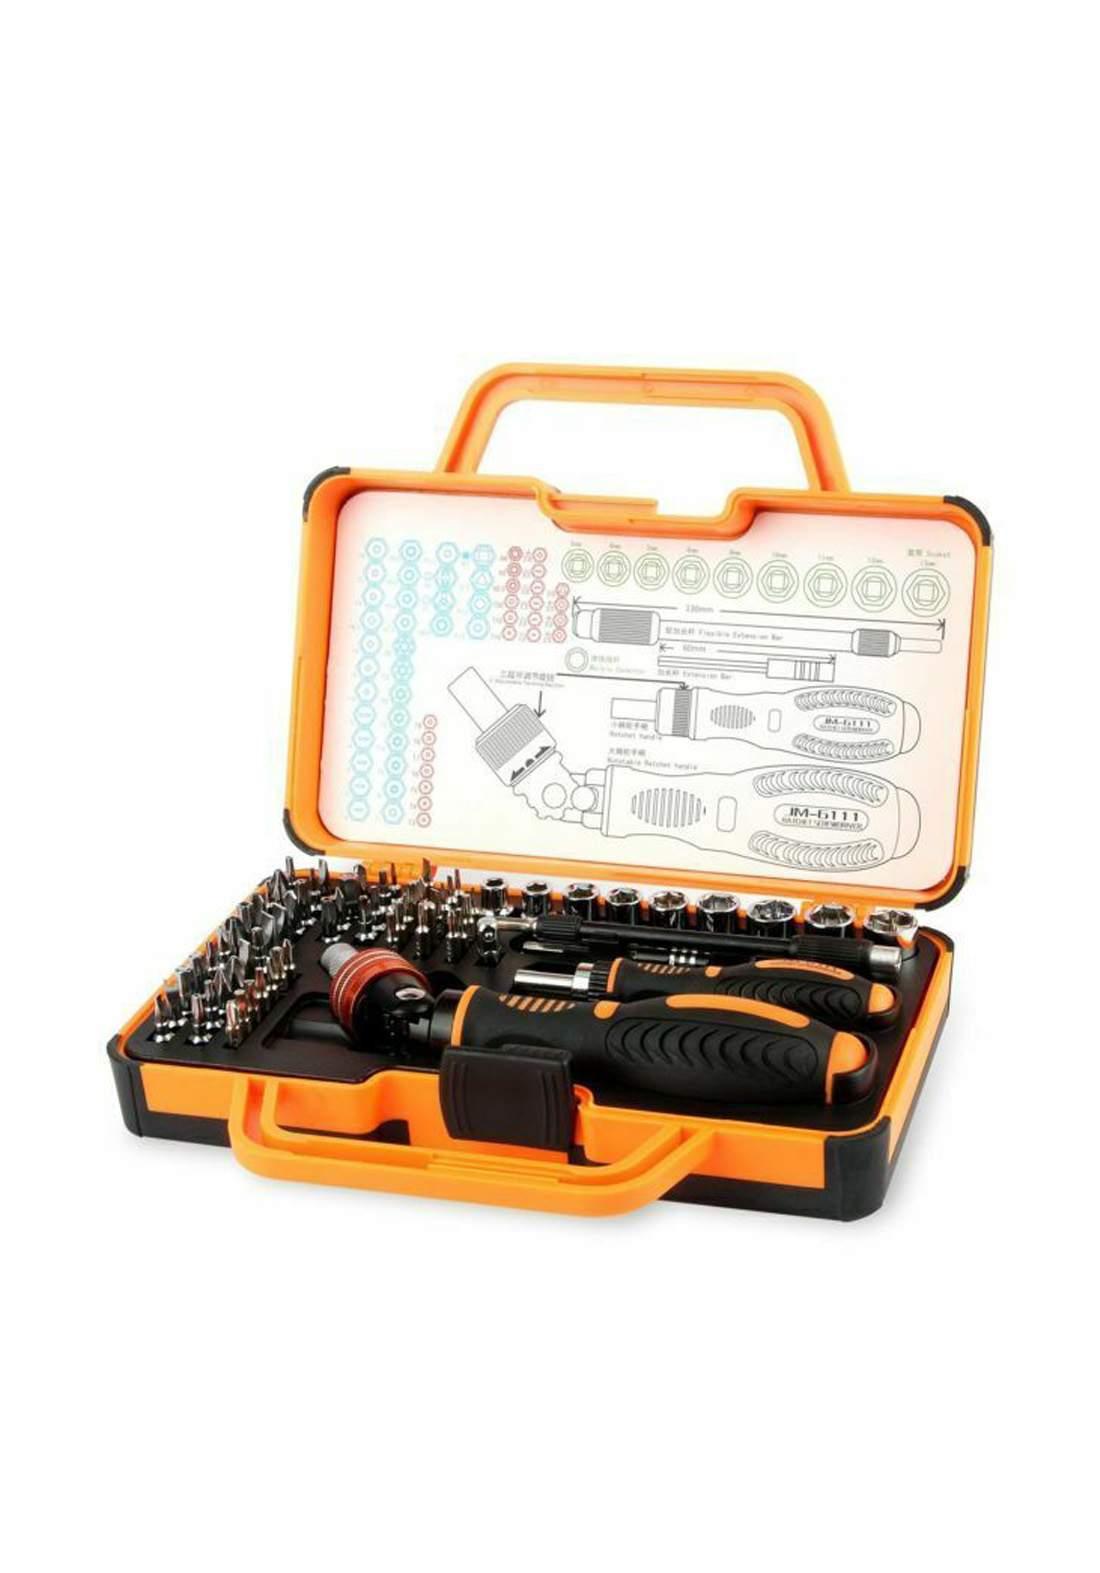 Jakemy JM-6111 Professional Multi Tool Set 69 in 1 Suitcase سيت رؤوس درنفيس